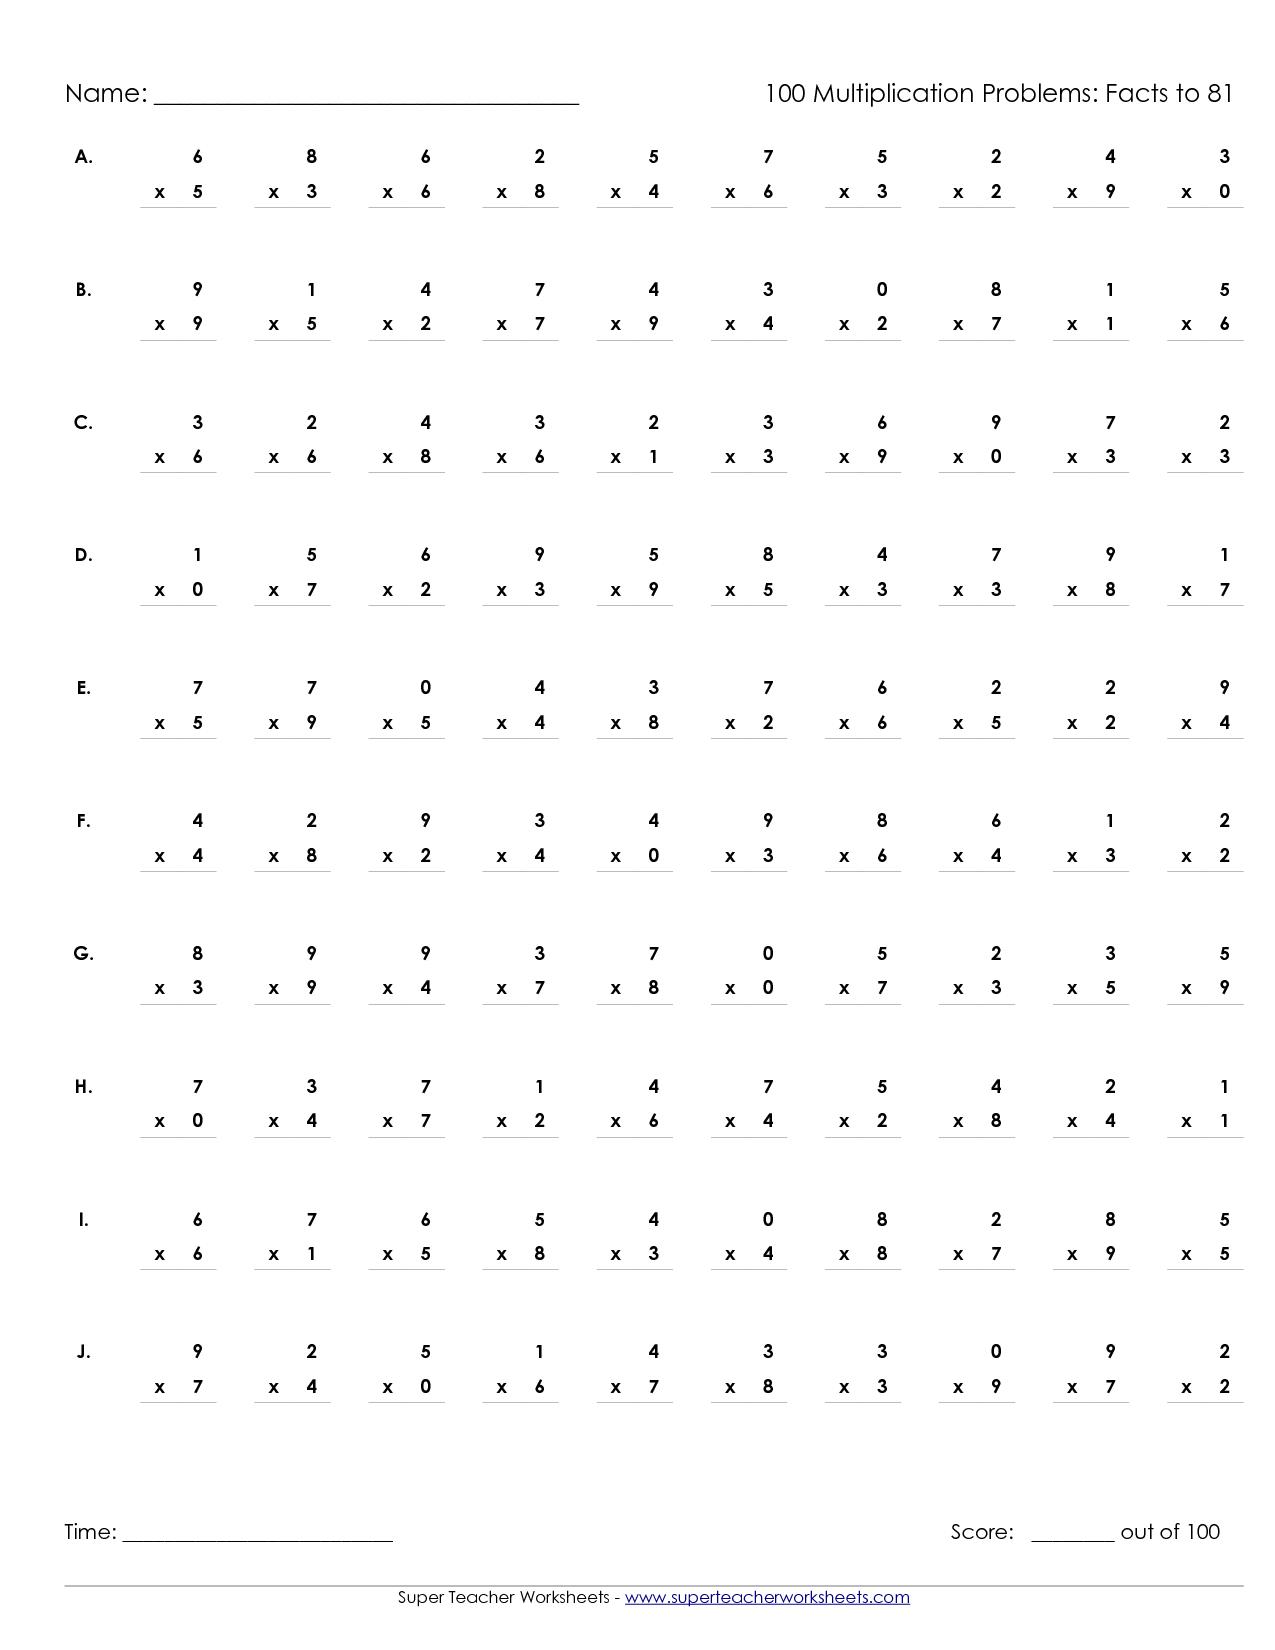 Printable Multiplication Worksheets 100 Problems